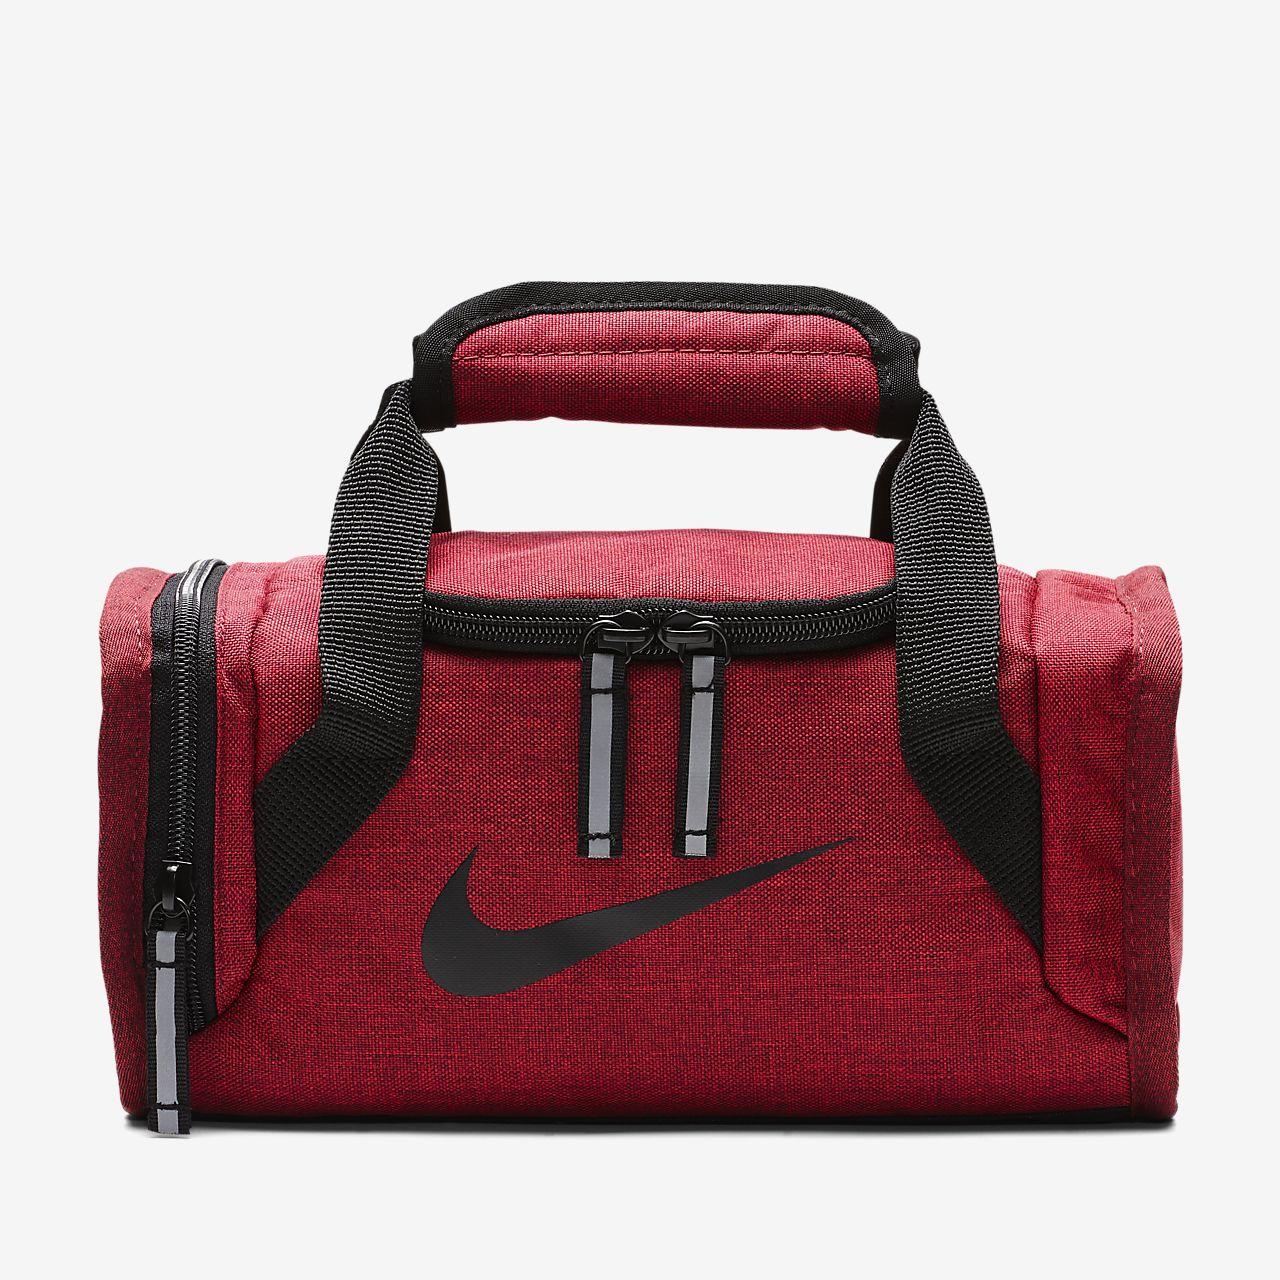 Brasilia Pack Para Fuel Nike El Es Paqz0axw Bolsa Almuerzo p51wqwnB